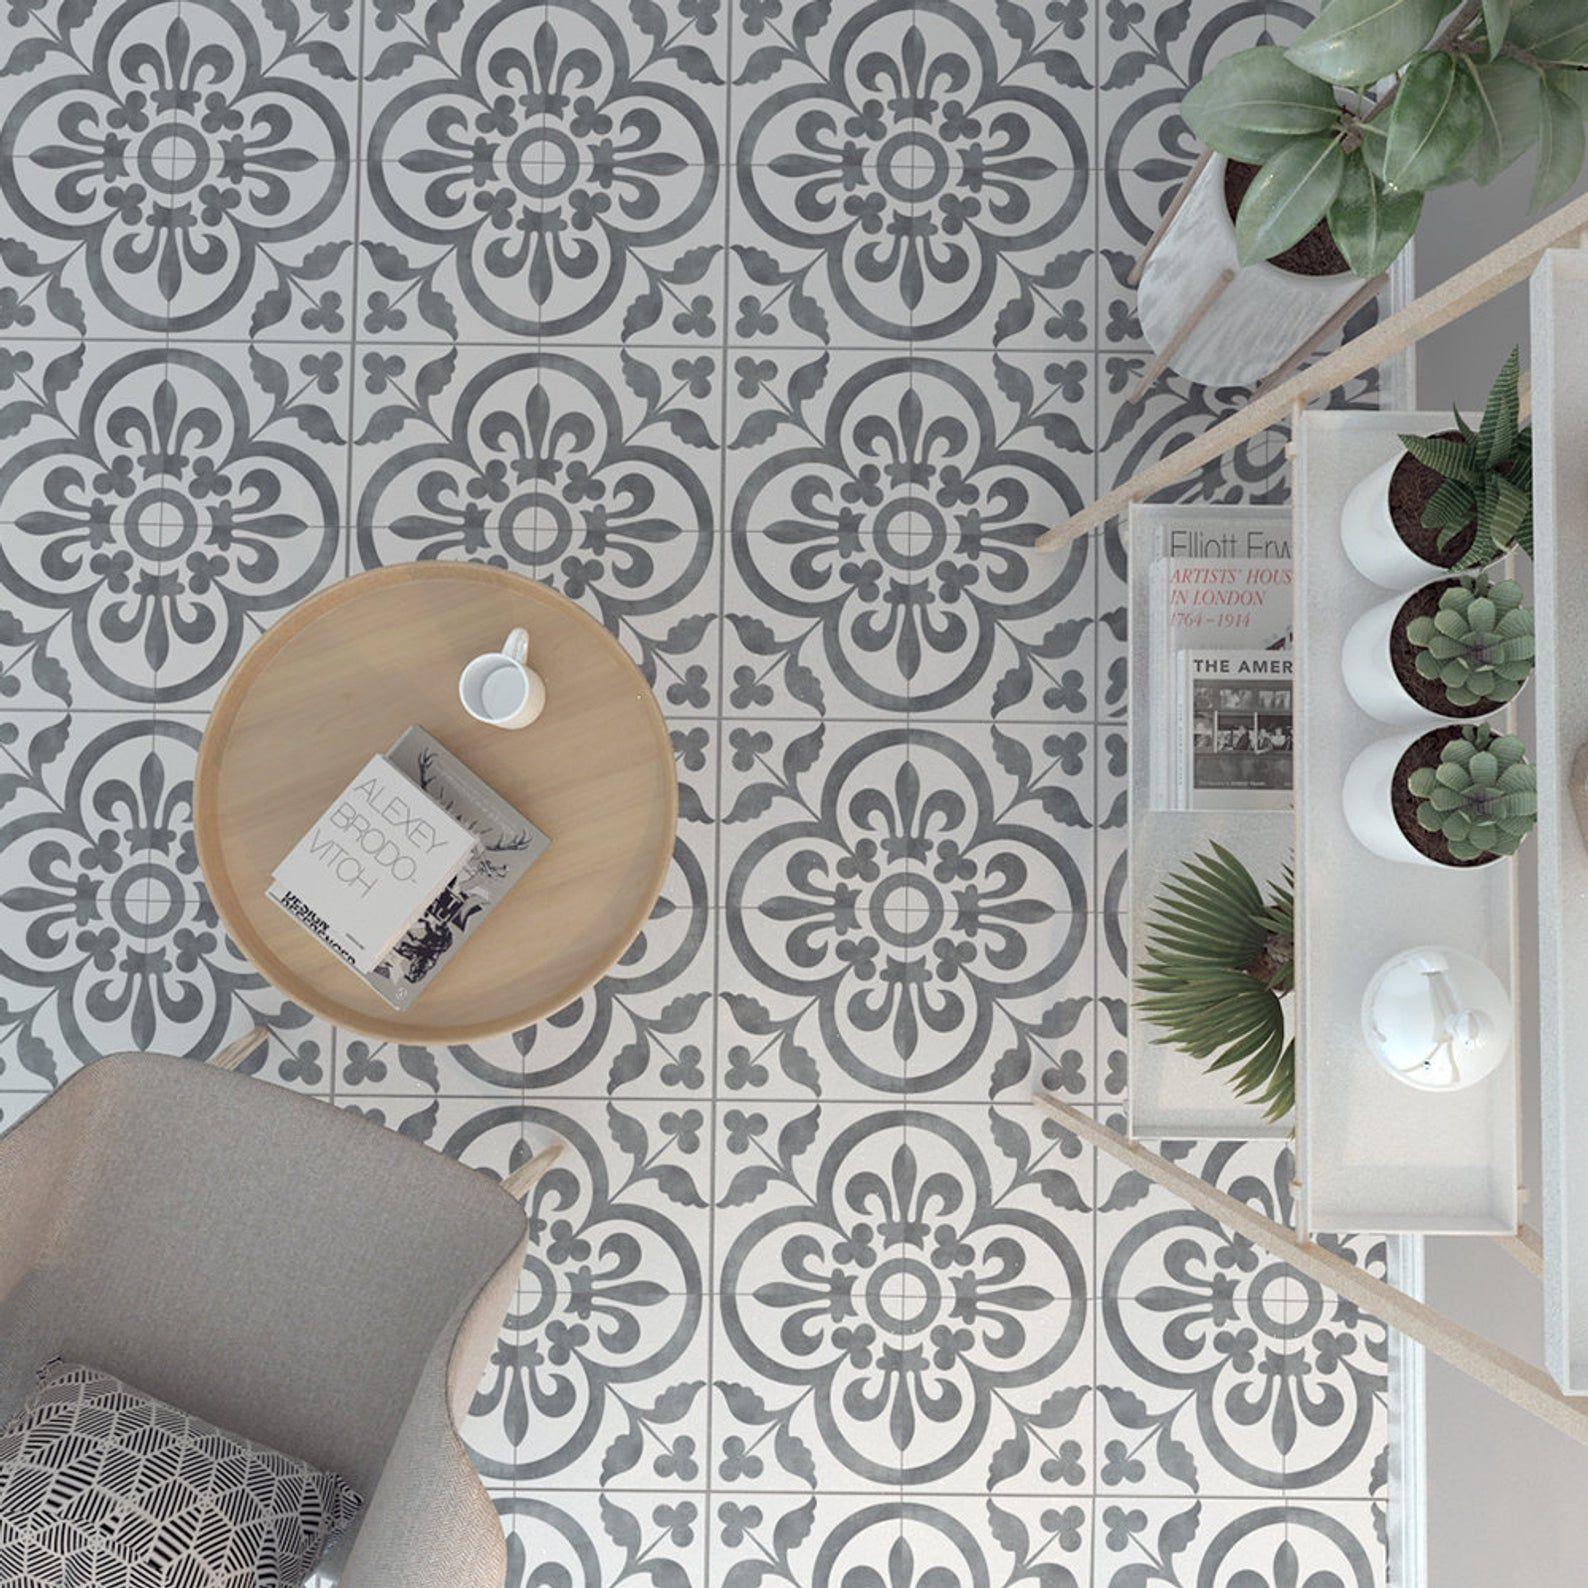 Sagres Tile Stickers Suitable For Wall And Floor Waterproof Tile Decoration All Sizes Modern Decor Art Print Pack Of 10 Sku Pet Fliesenaufkleber Moderne Dekoration Und Fliesen Sticker